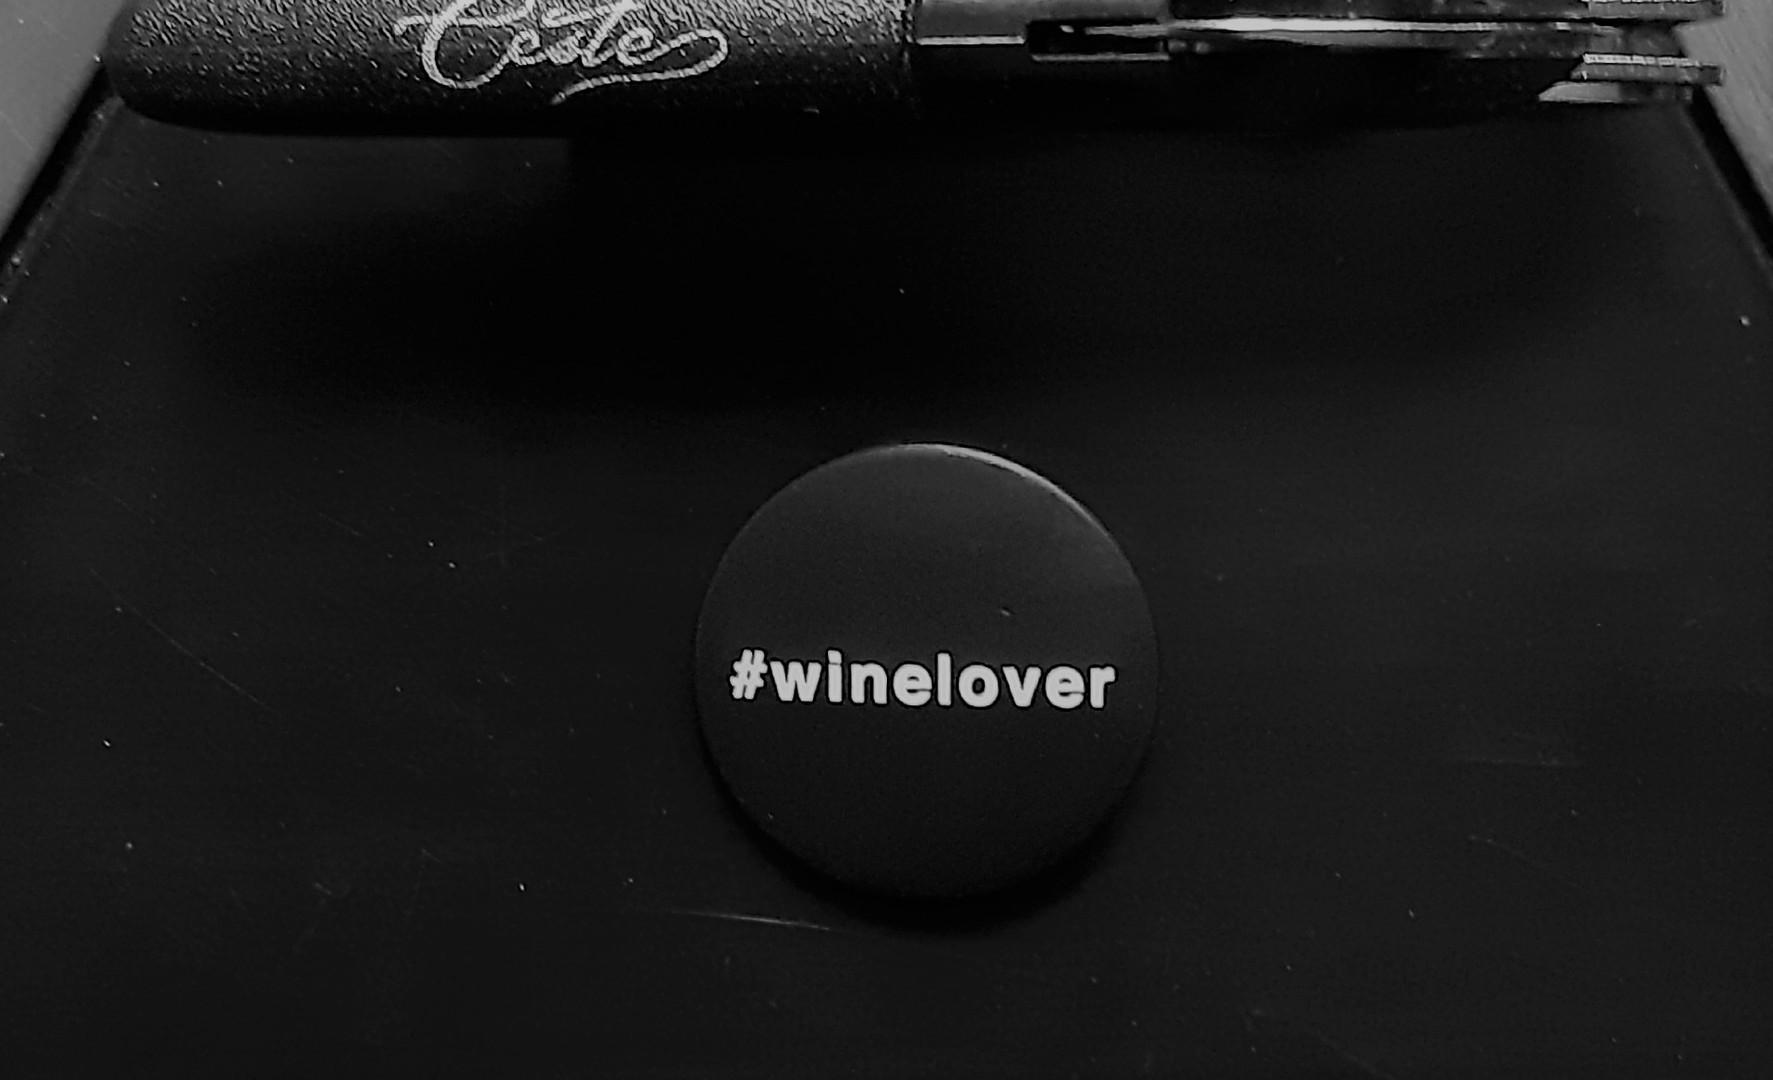 ceste corkscrew and #winelover.jpg